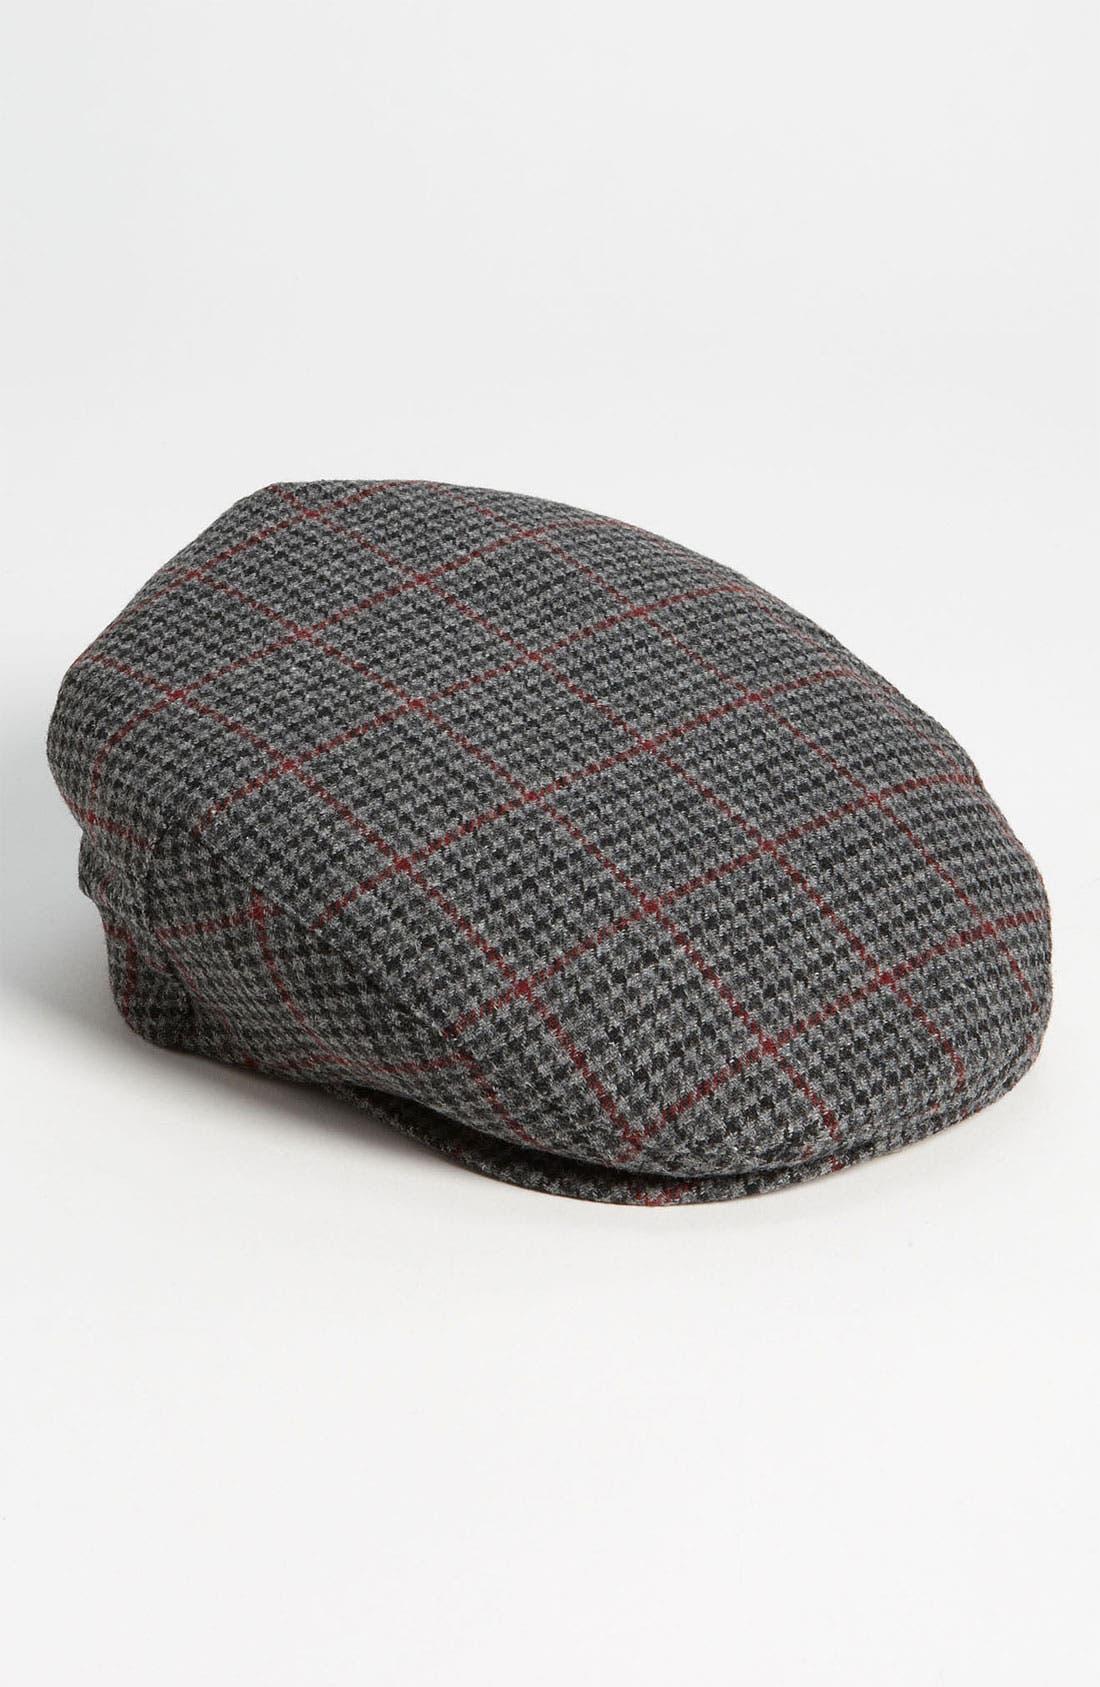 Alternate Image 1 Selected - Brixton 'Barrel' Driver's Cap